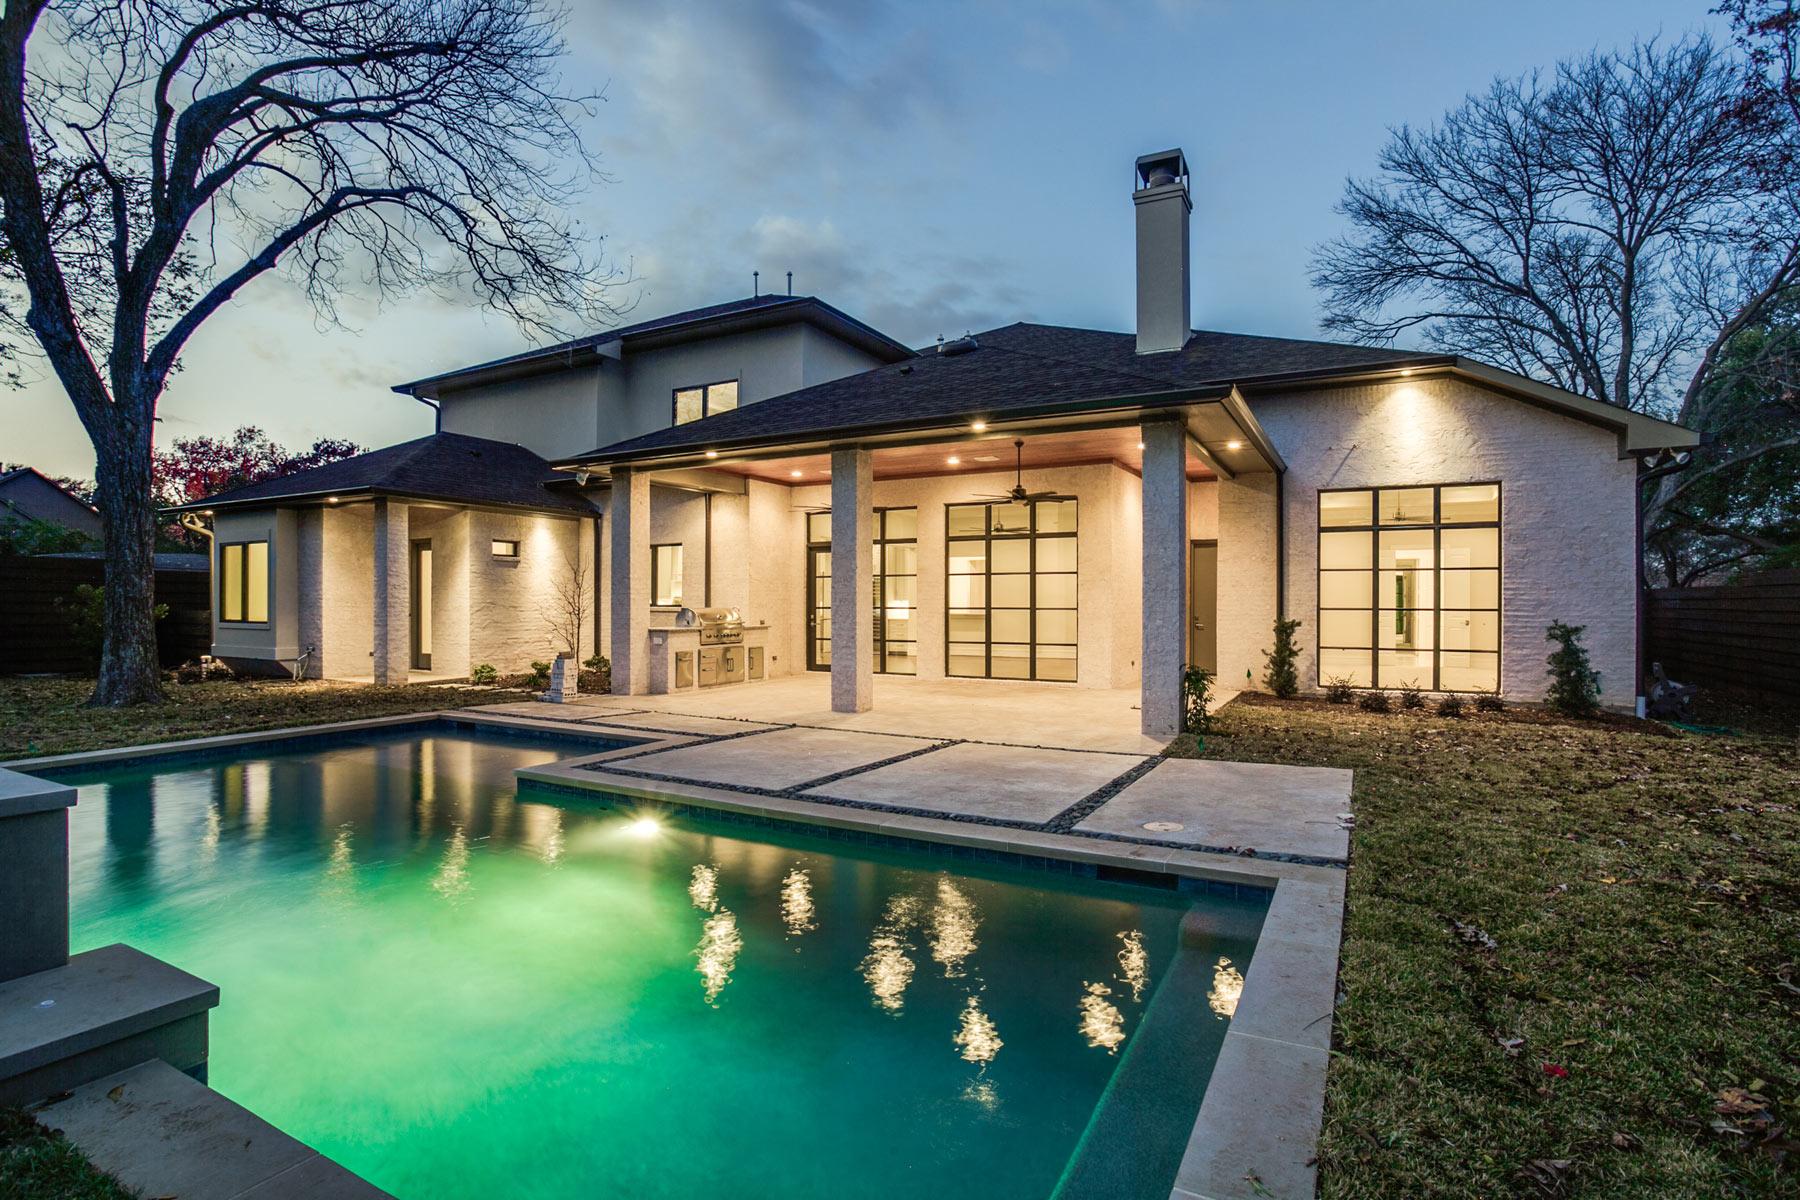 Transitional modern in preston hollow sold desco fine for Modern home builders dallas